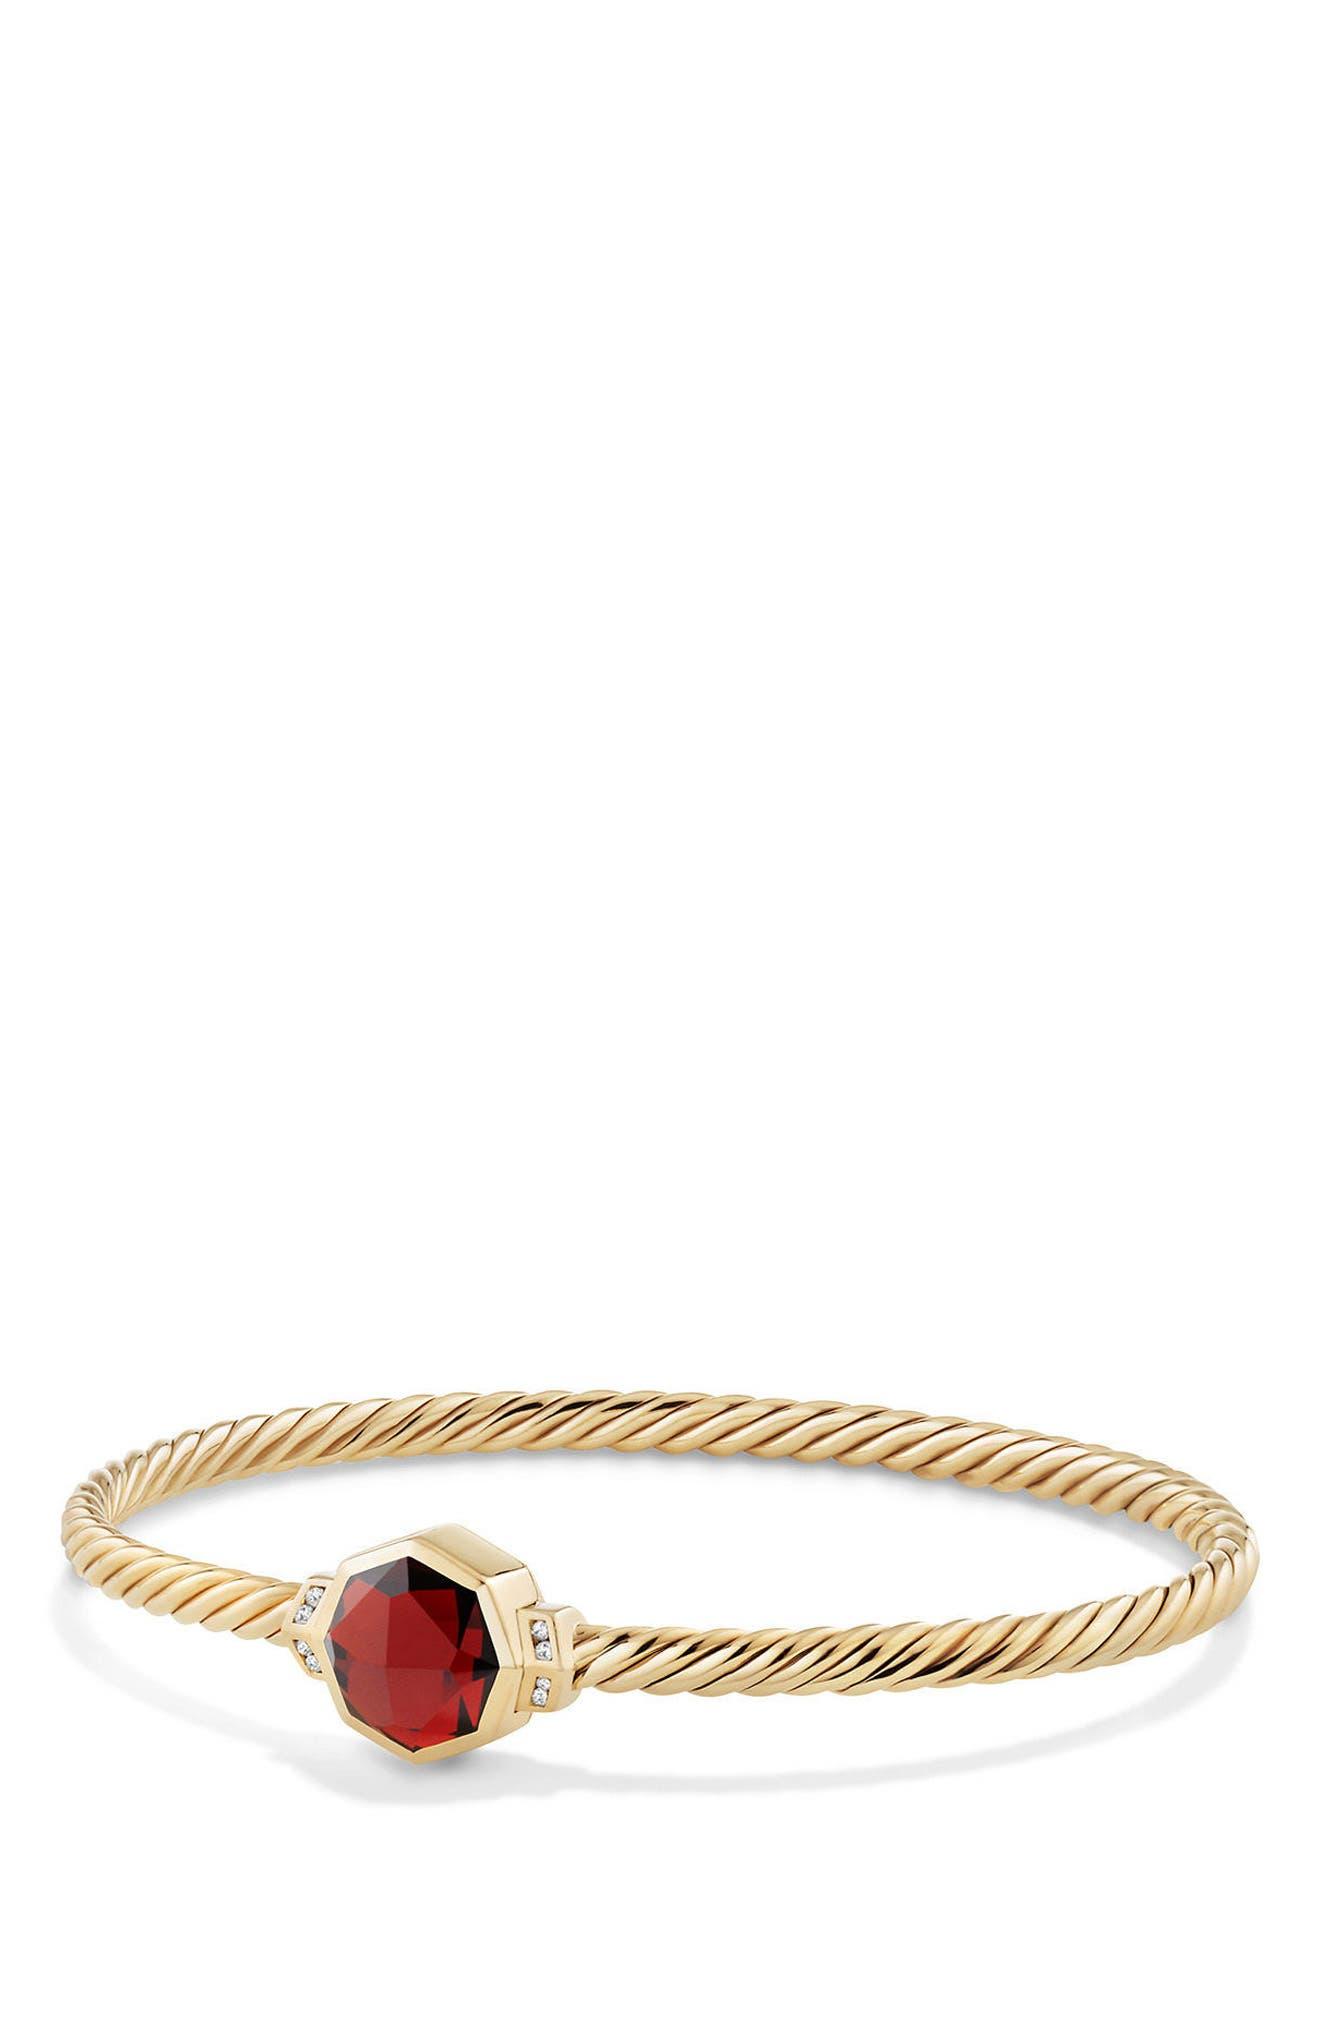 DAVID YURMAN Guilin Octagon Bracelet with Diamonds in